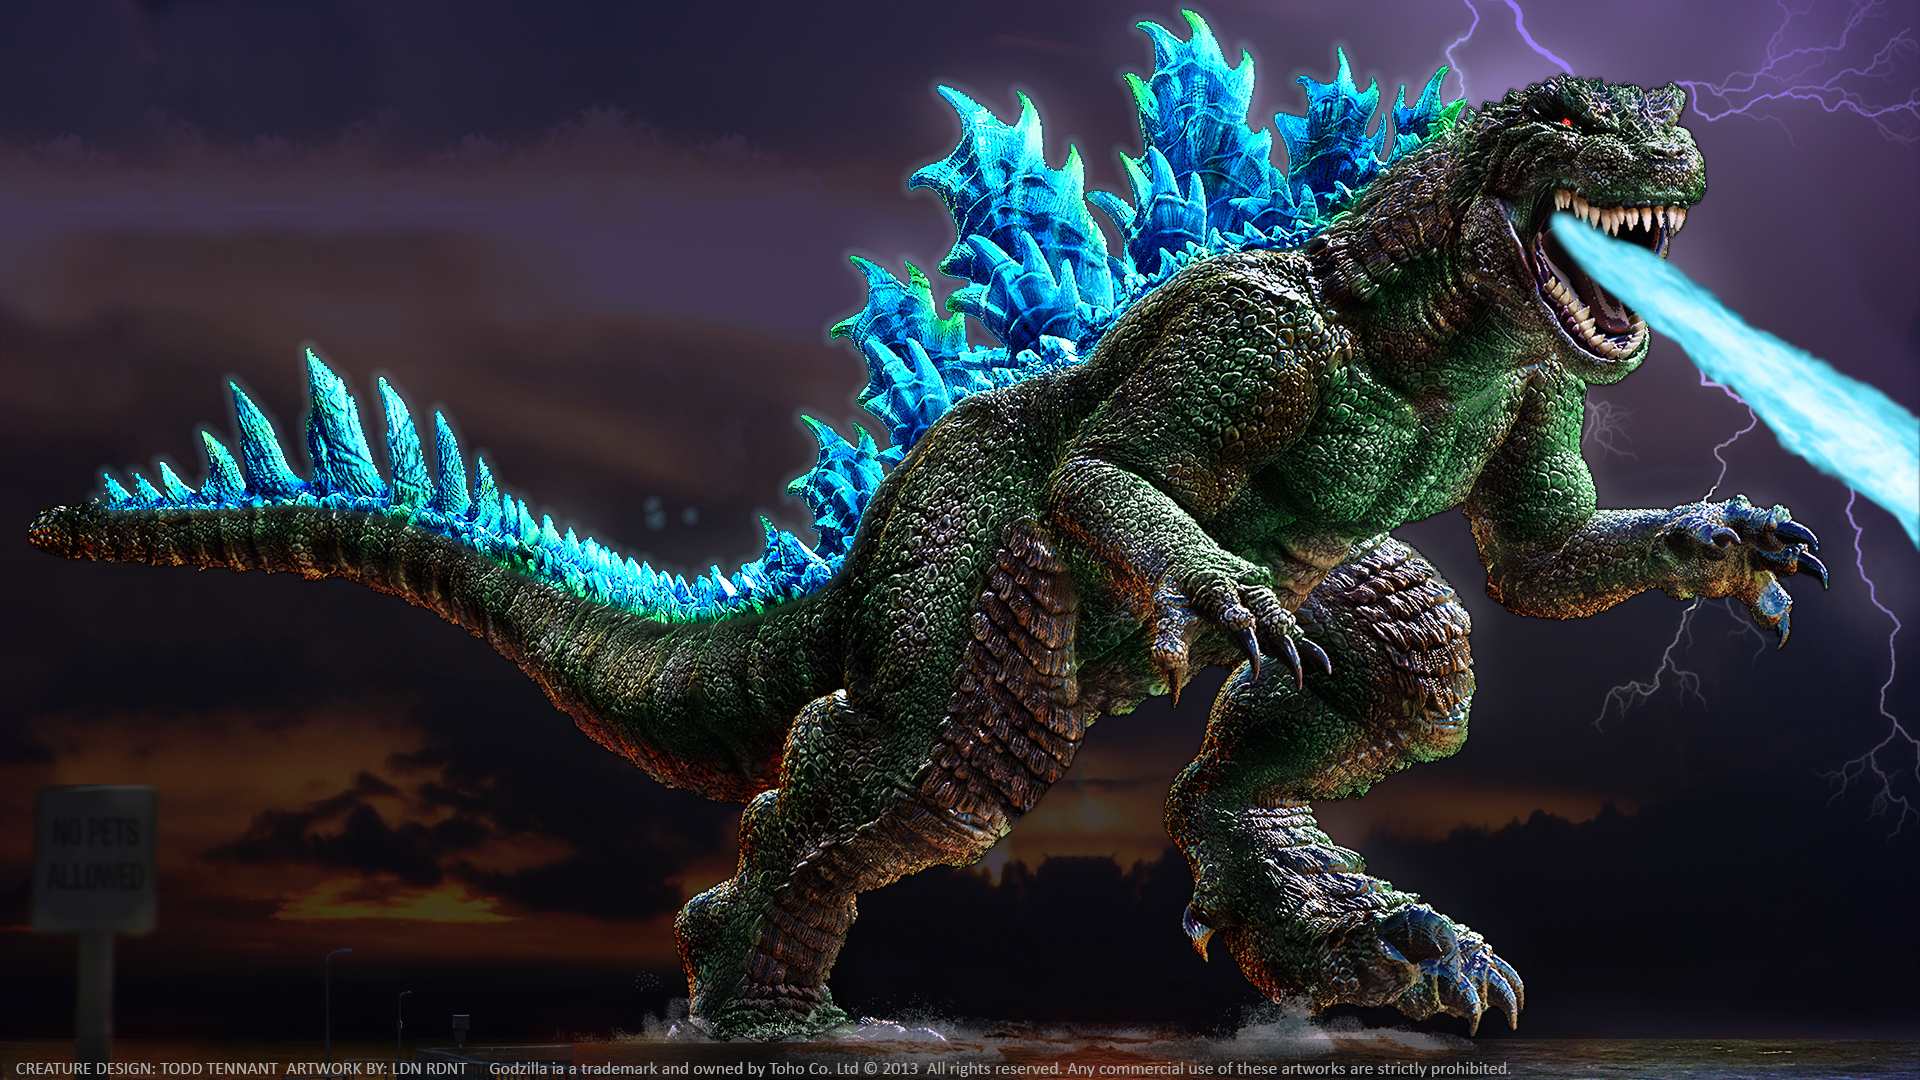 10+] Free Godzilla Desktop Wallpapers on WallpaperSafari